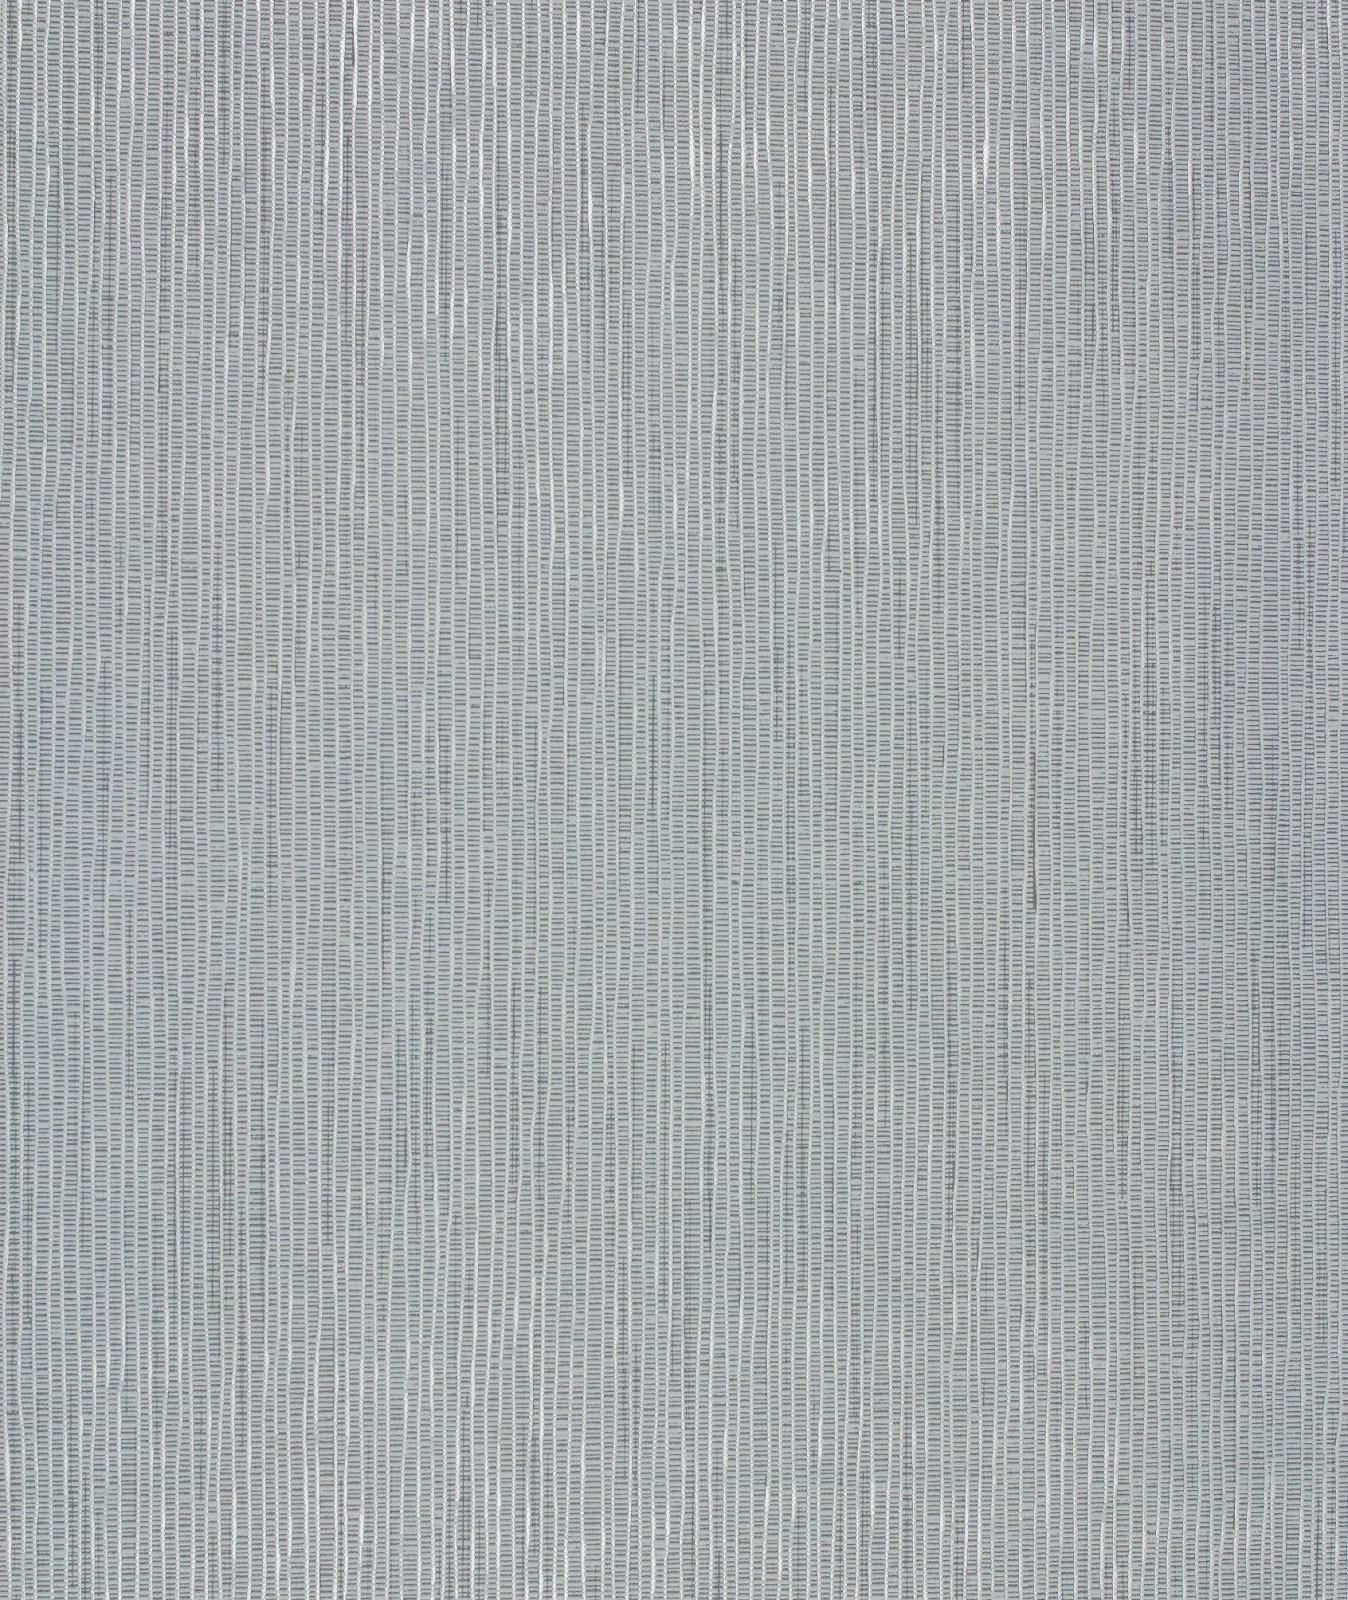 tapete tetris rasch 754056 unitapete grau silber. Black Bedroom Furniture Sets. Home Design Ideas